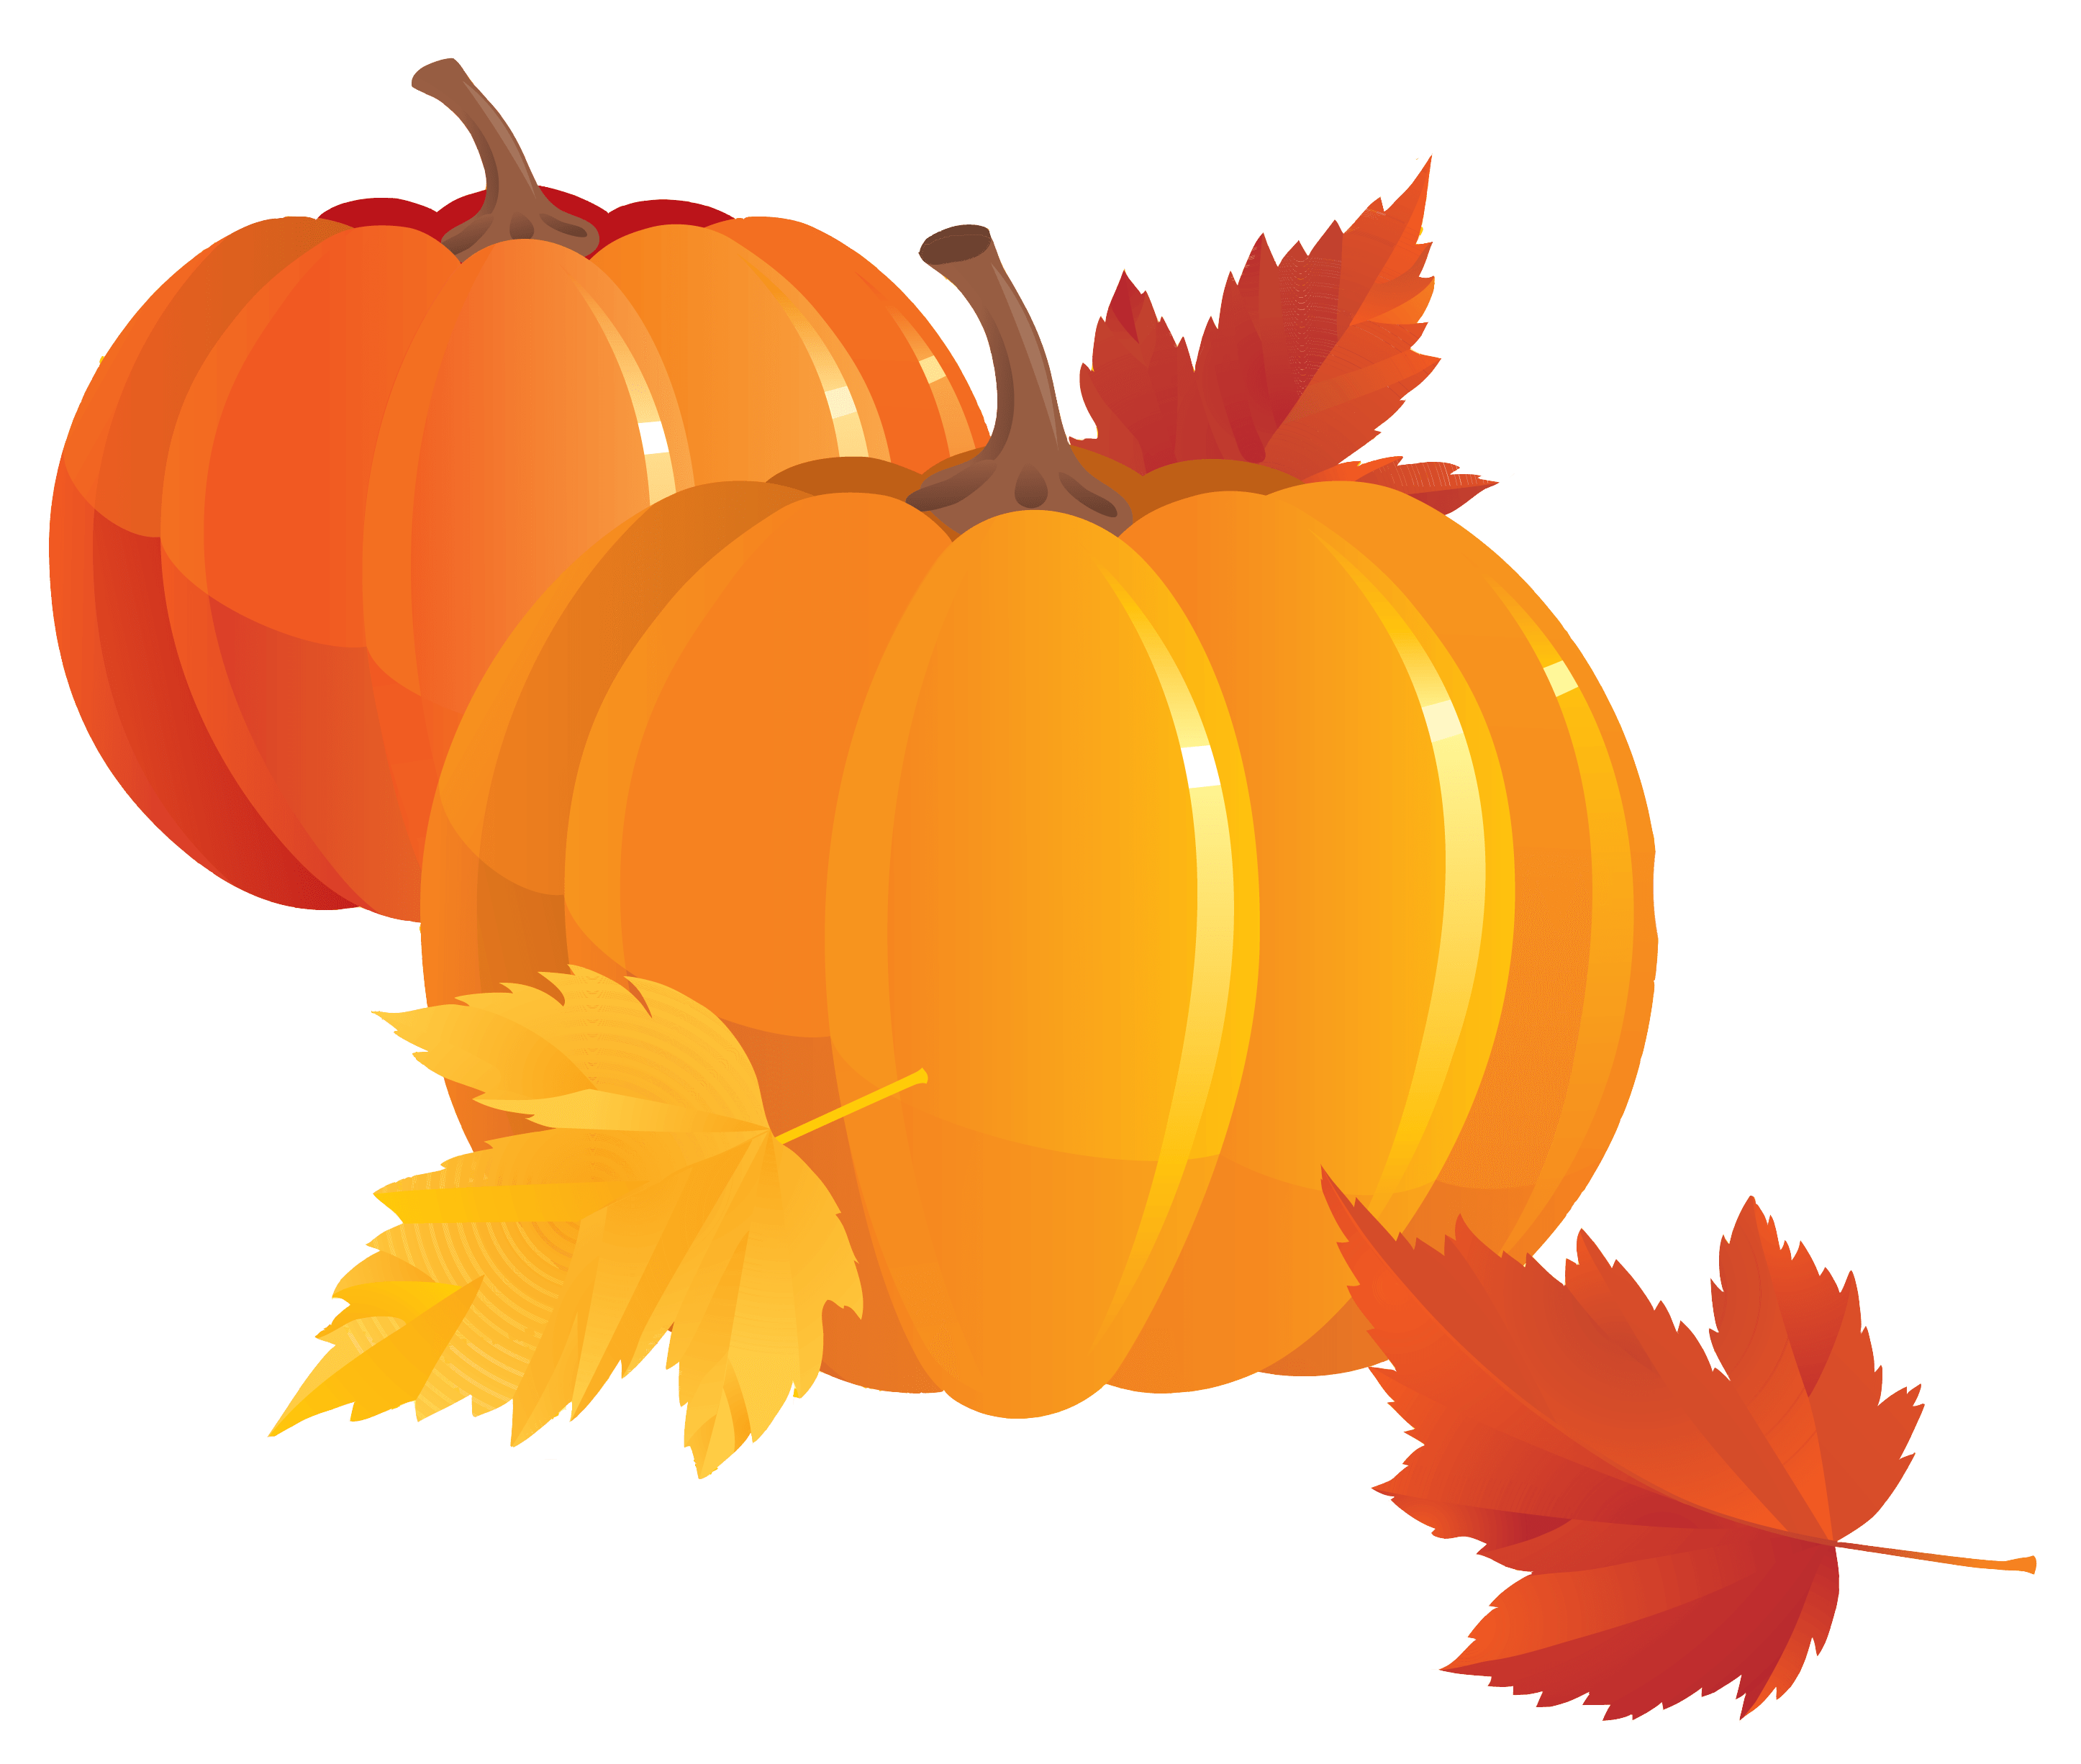 Clipart pumpkin autumn. Pumpkins transparent png images